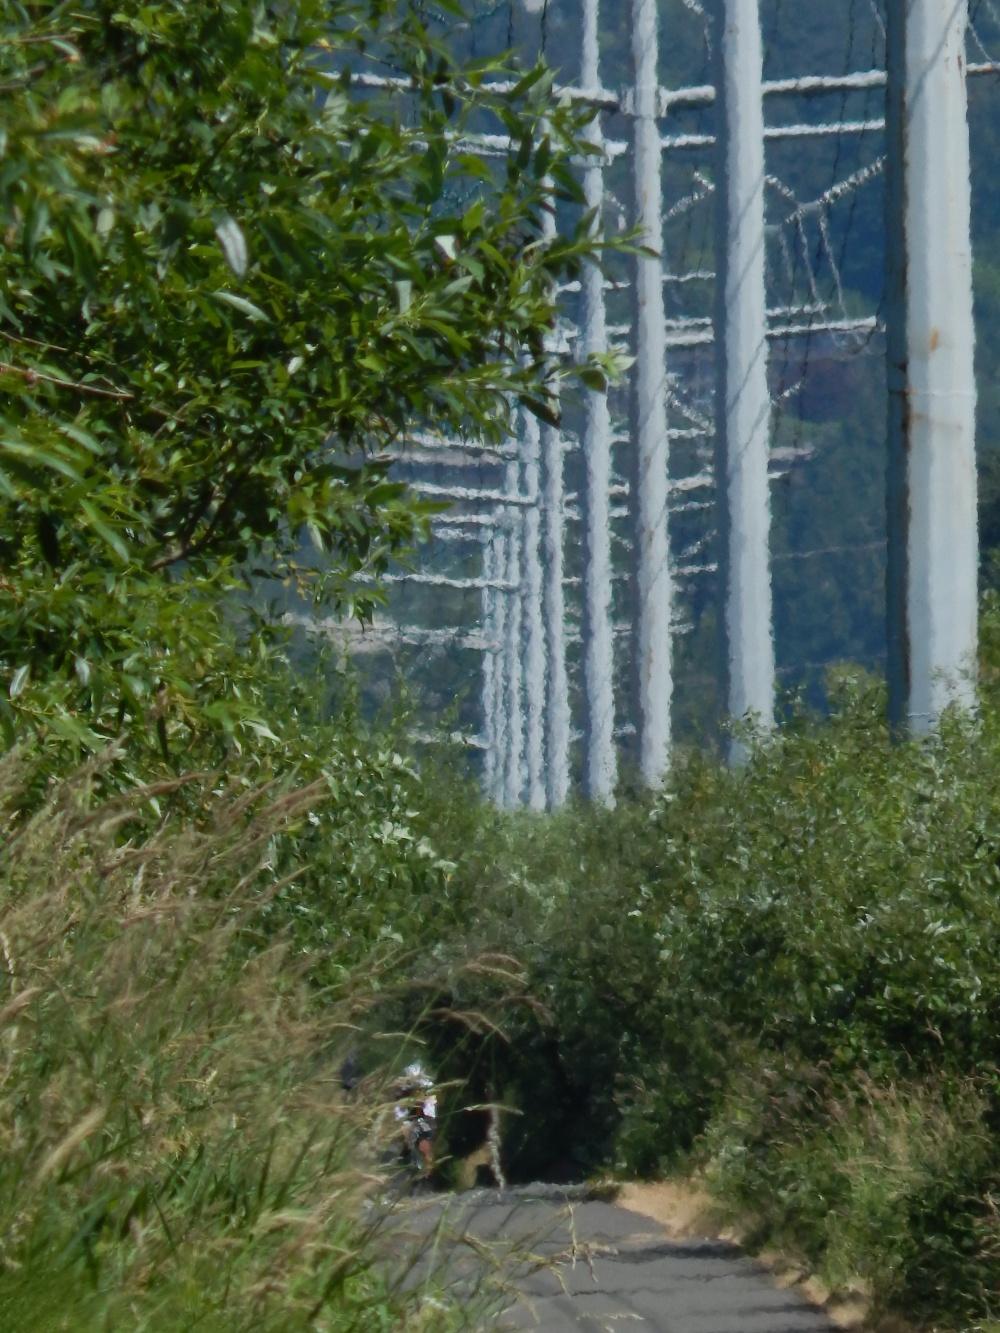 Power lines create optic illusion on Interurban trail